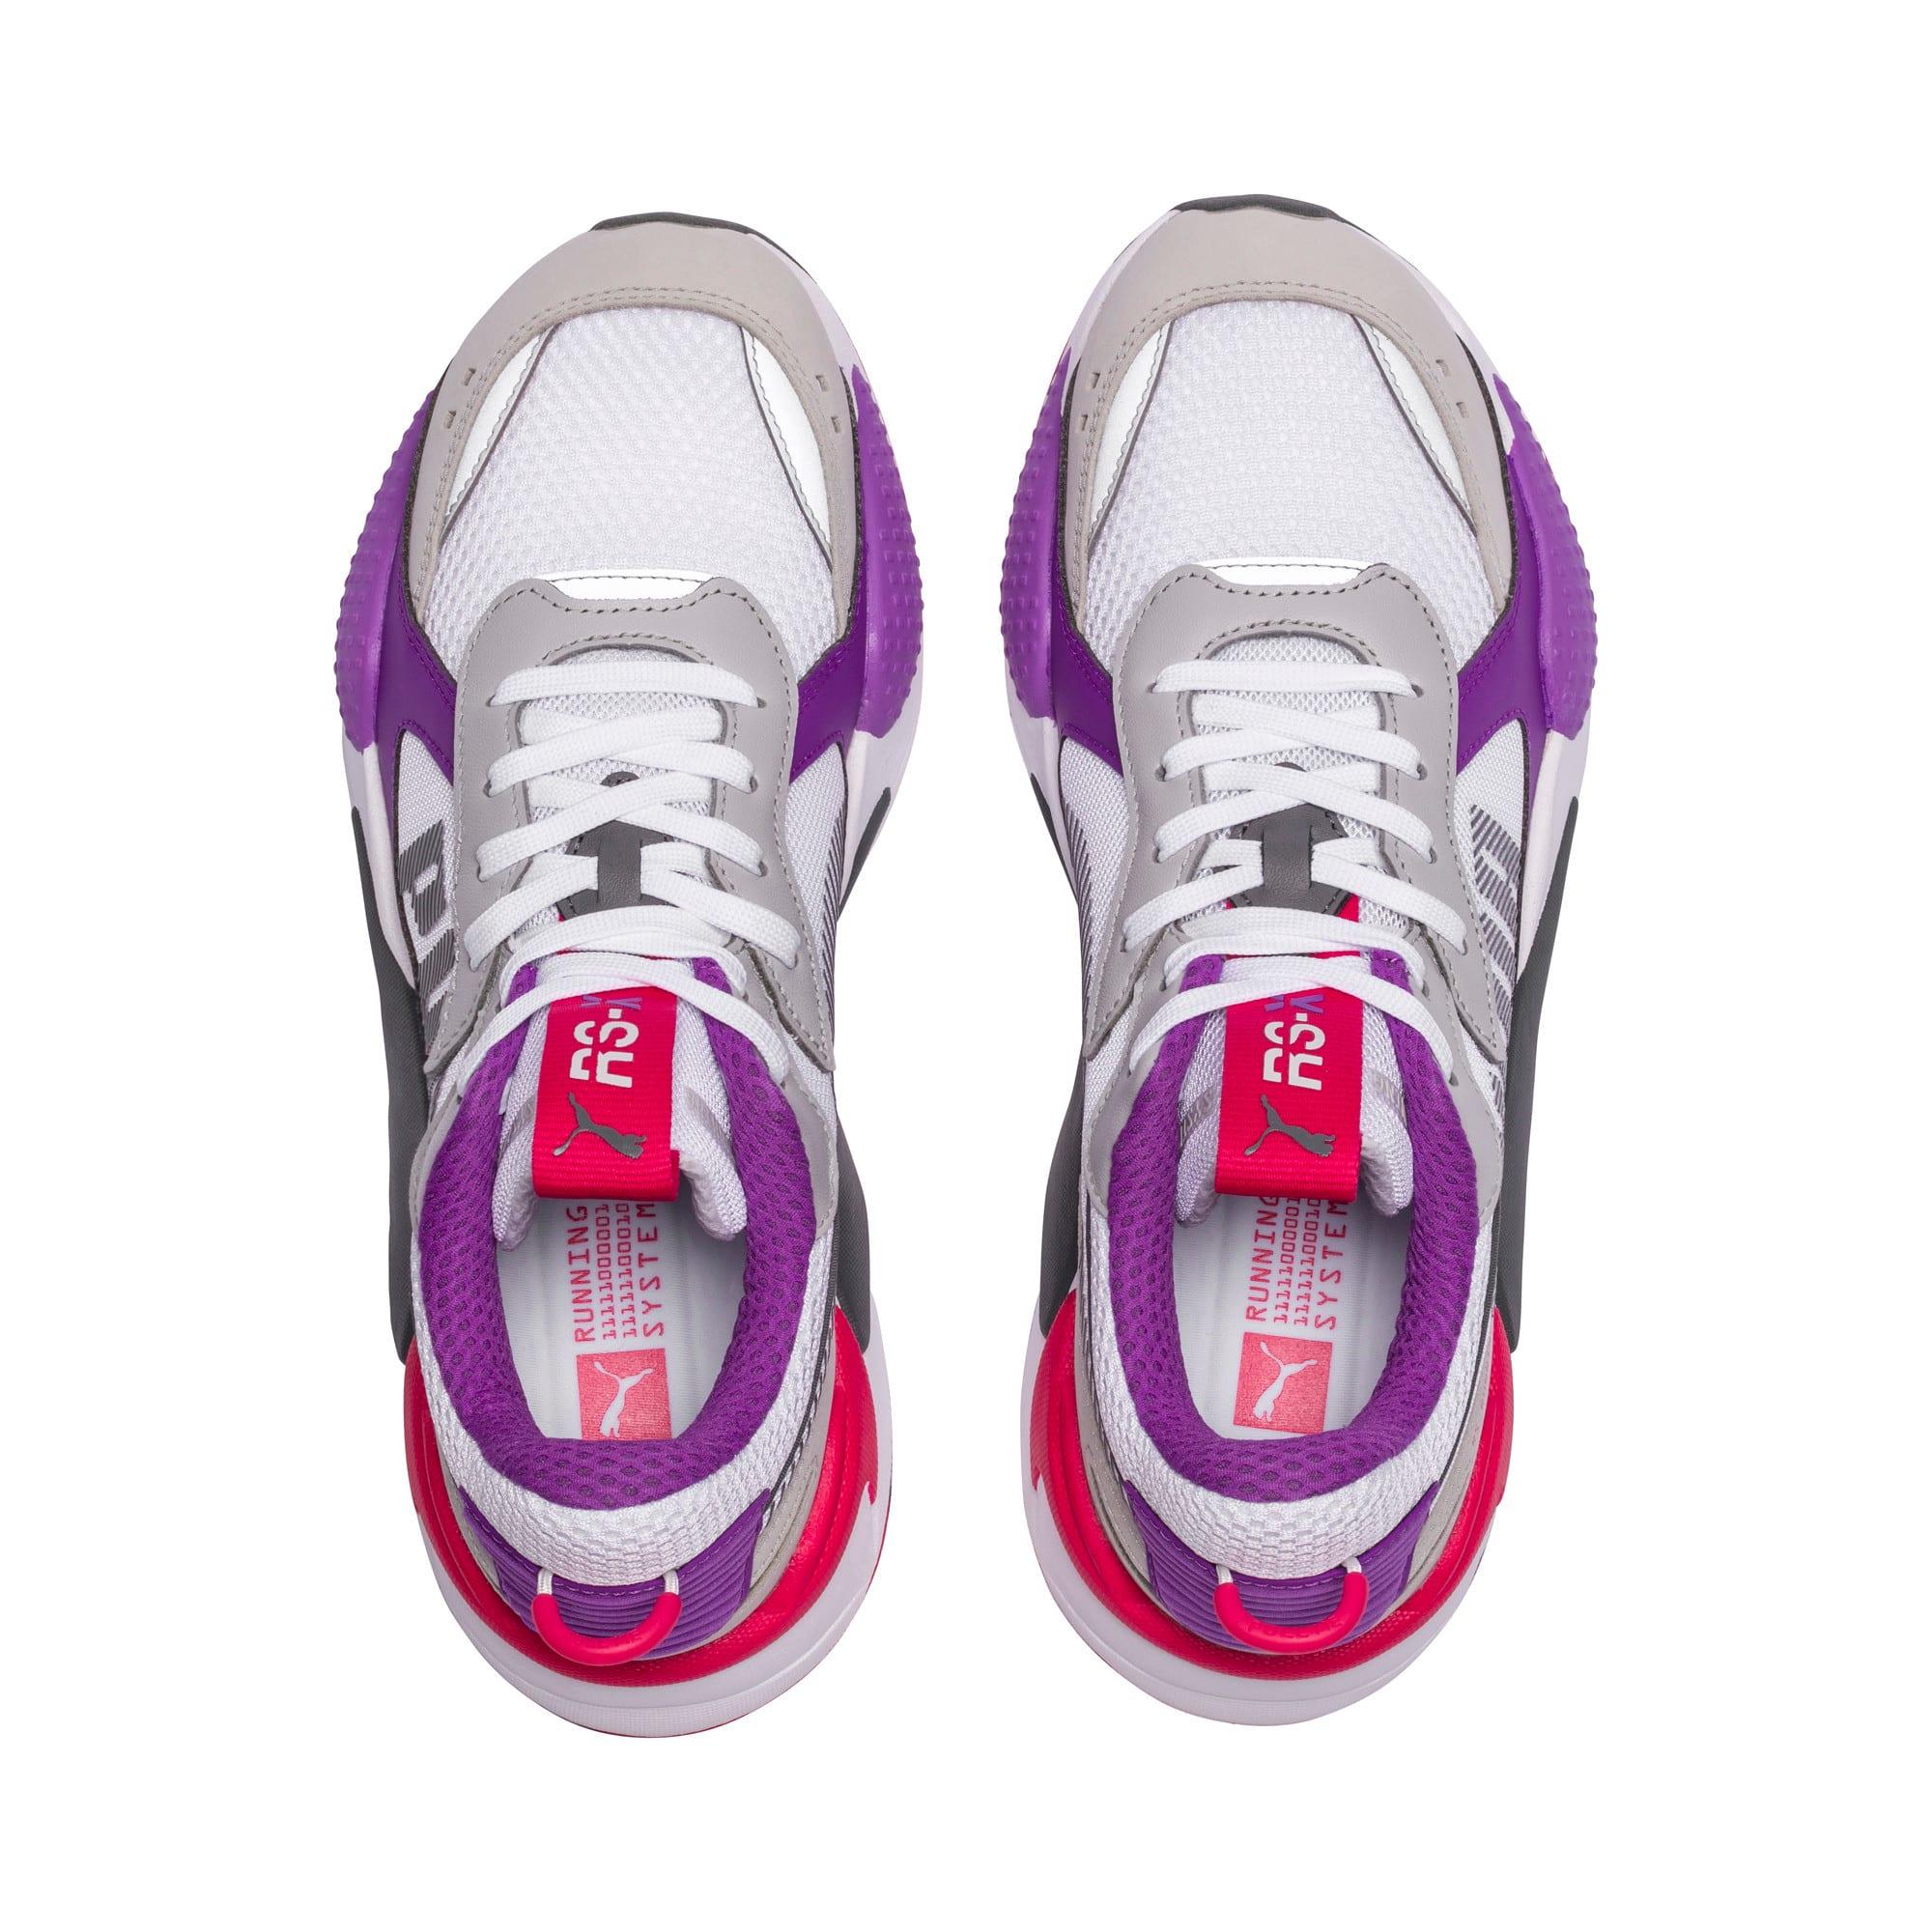 Thumbnail 6 of RS-X Bold Sneaker, PWhite-High Rise-Royal Lilac, medium